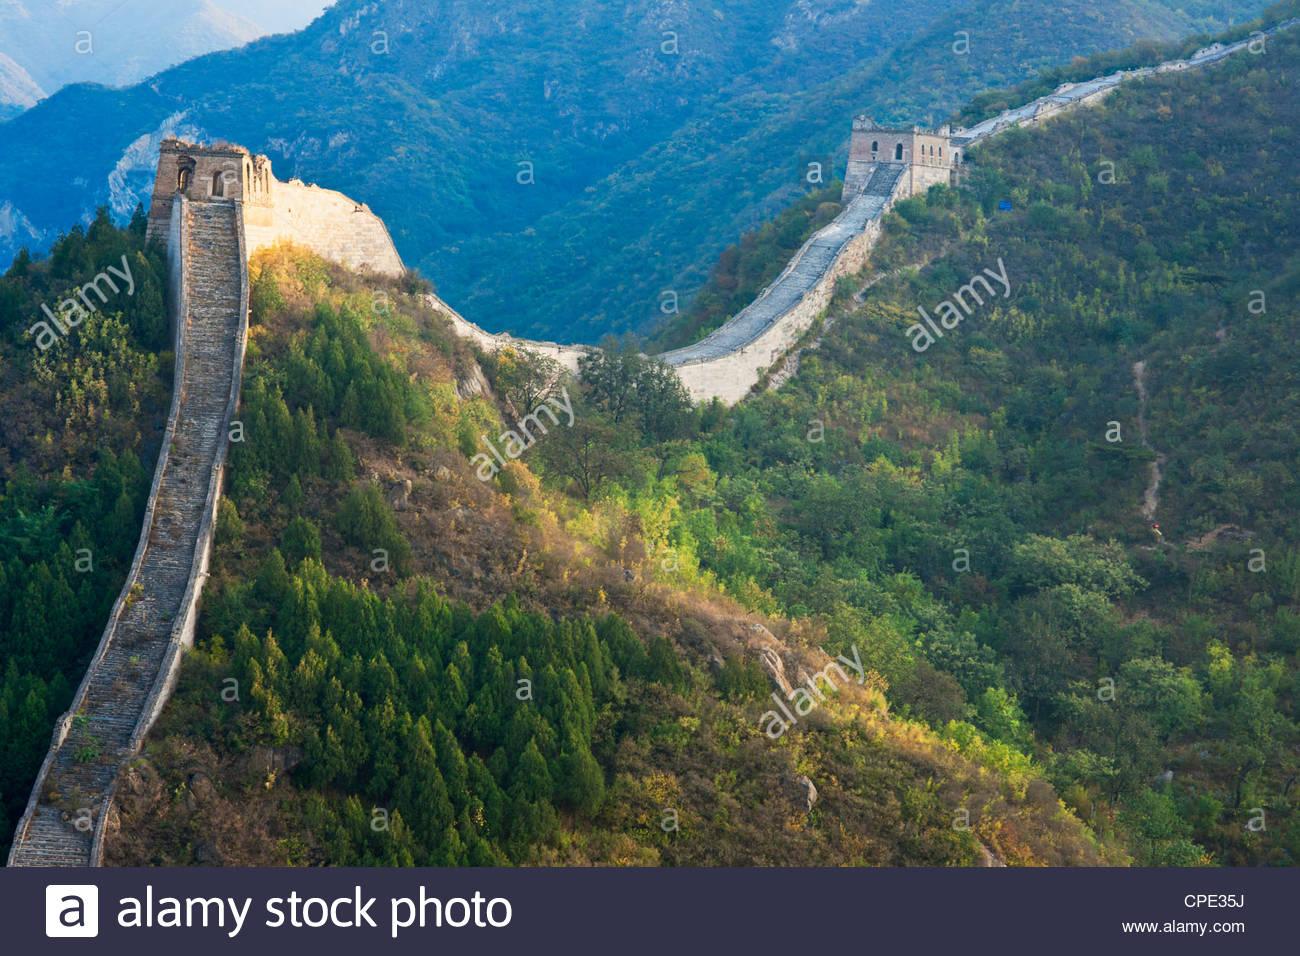 Overview of weathered section, Great Wall of China, Huanghuacheng (Yellow Flower), Wild Wall, Jiuduhe town, Huairou, Stock Photo